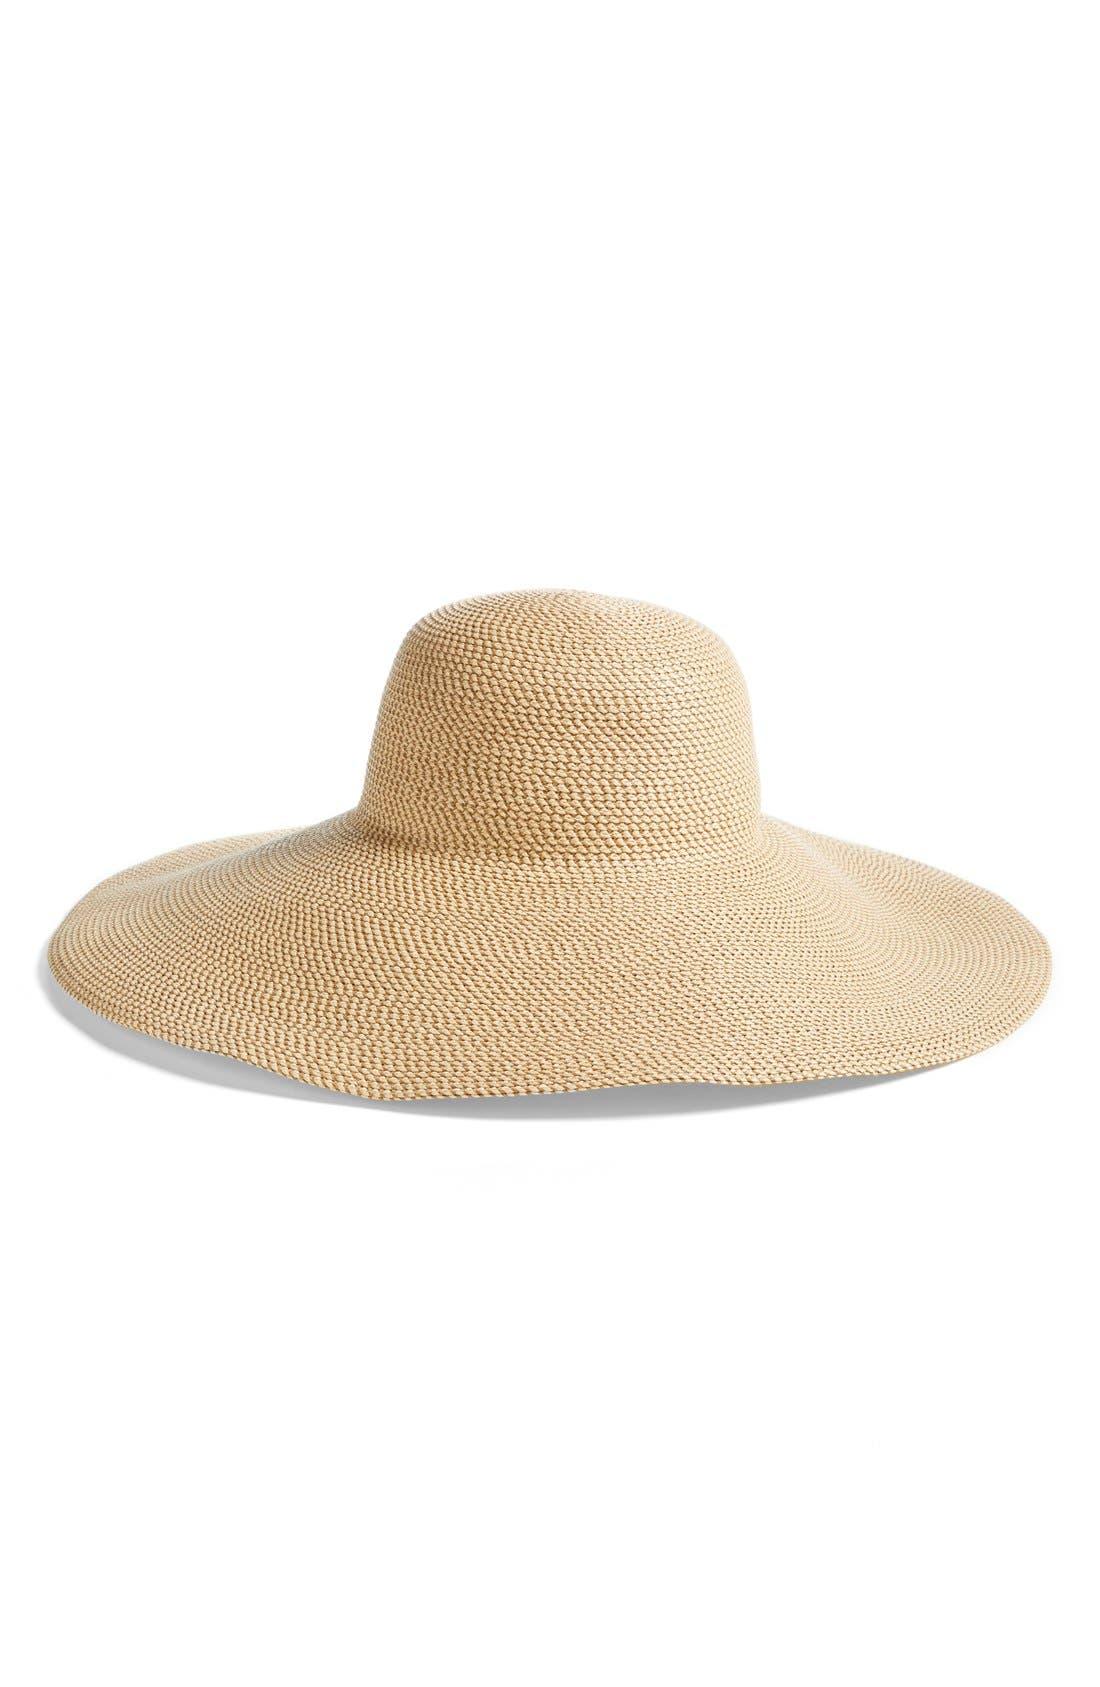 Alternate Image 1 Selected - Eric Javits Floppy Straw Hat